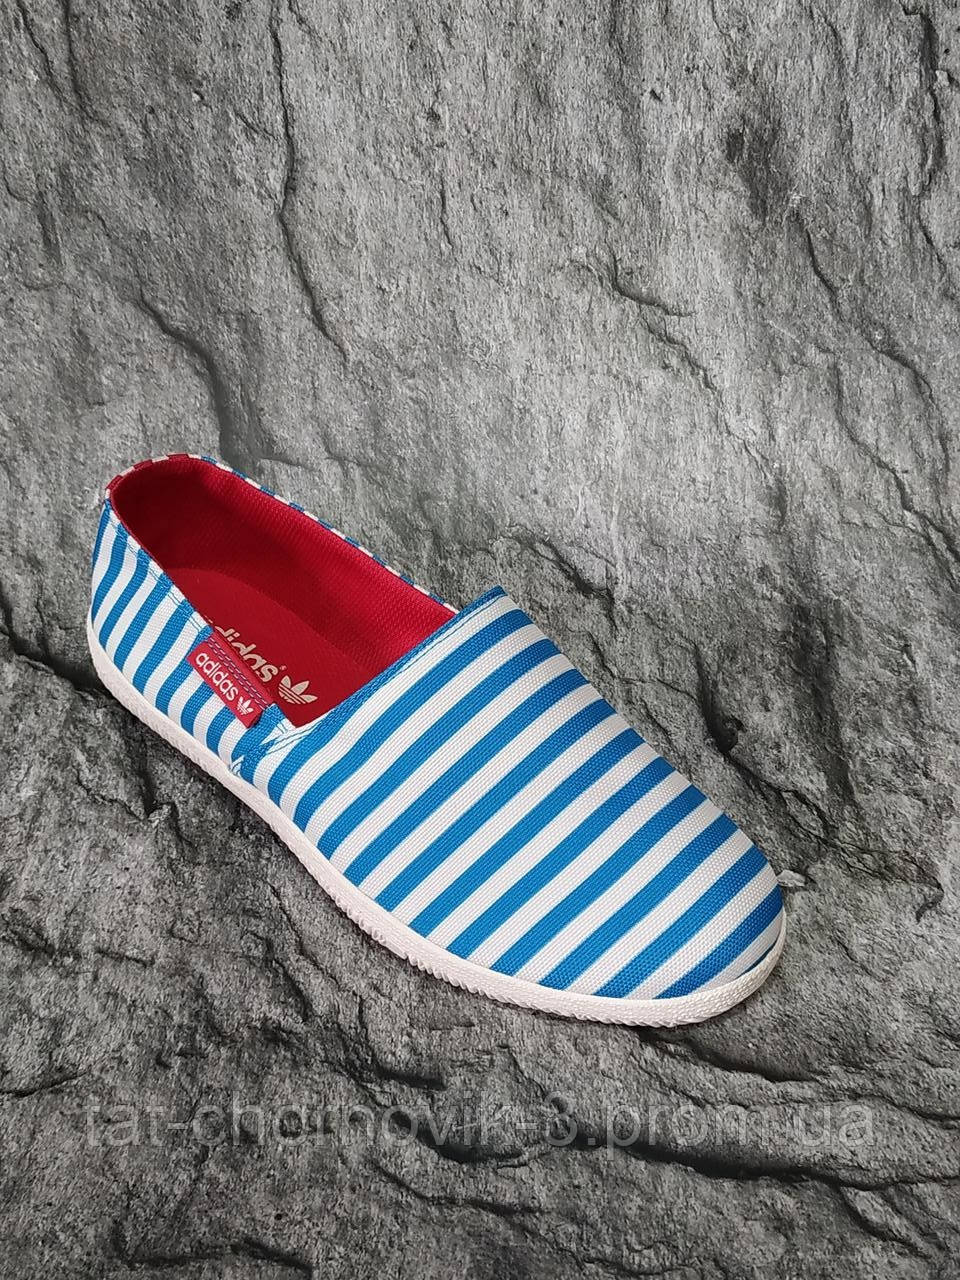 Adidas Originals Adidrill Unisex Classic Slip On Holiday Espadrilles